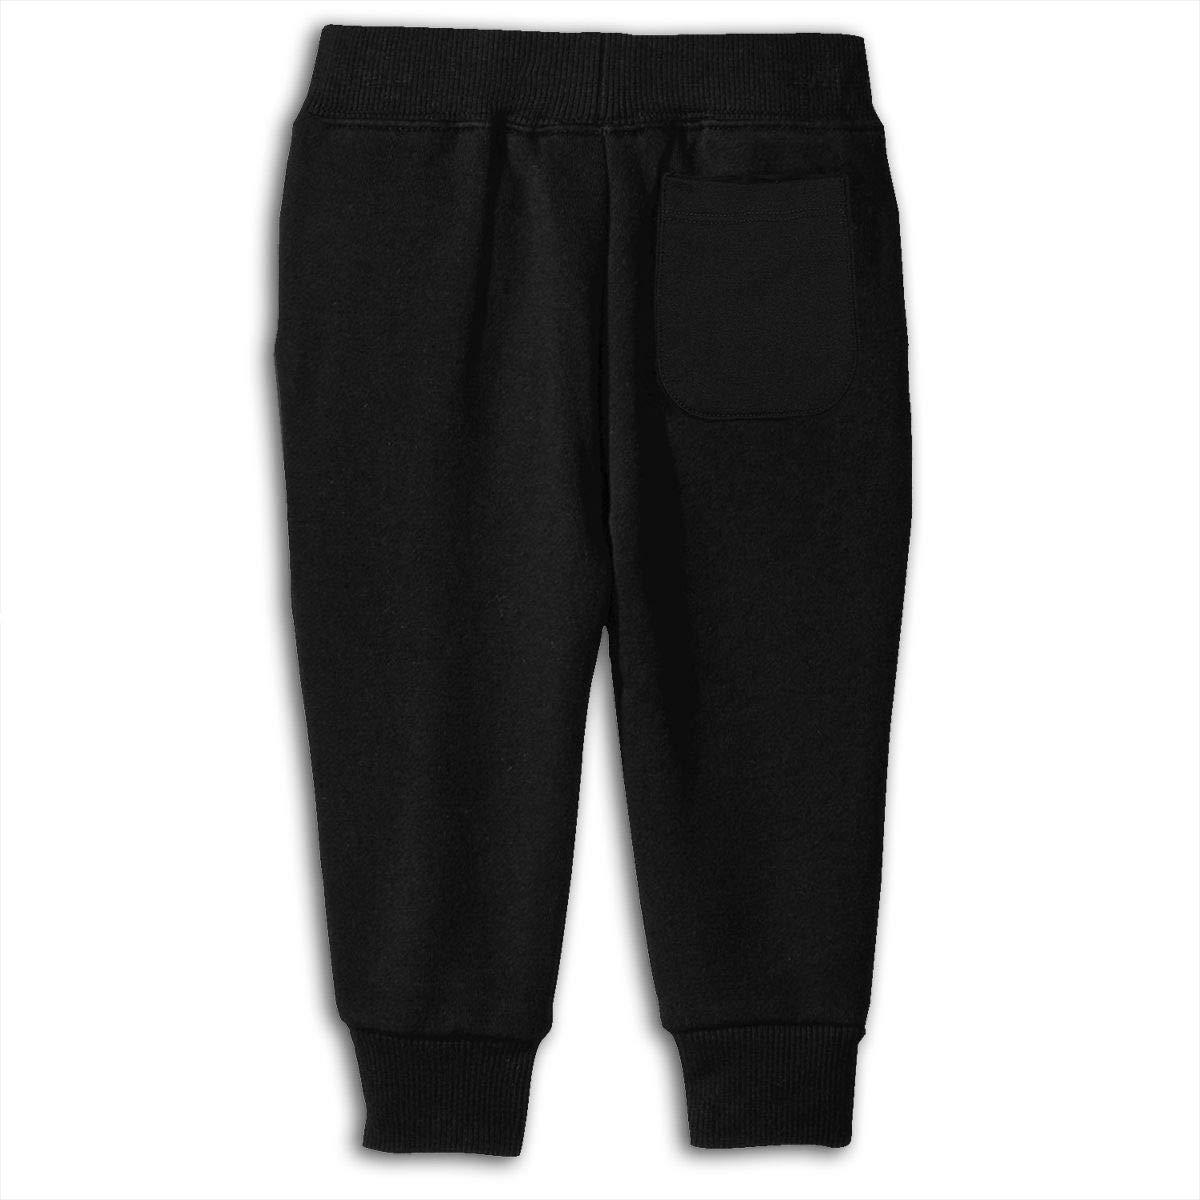 Childrens Fleece Pants NJKM5MJ Id Rather Be Lifting Weight-1 Sweatpants